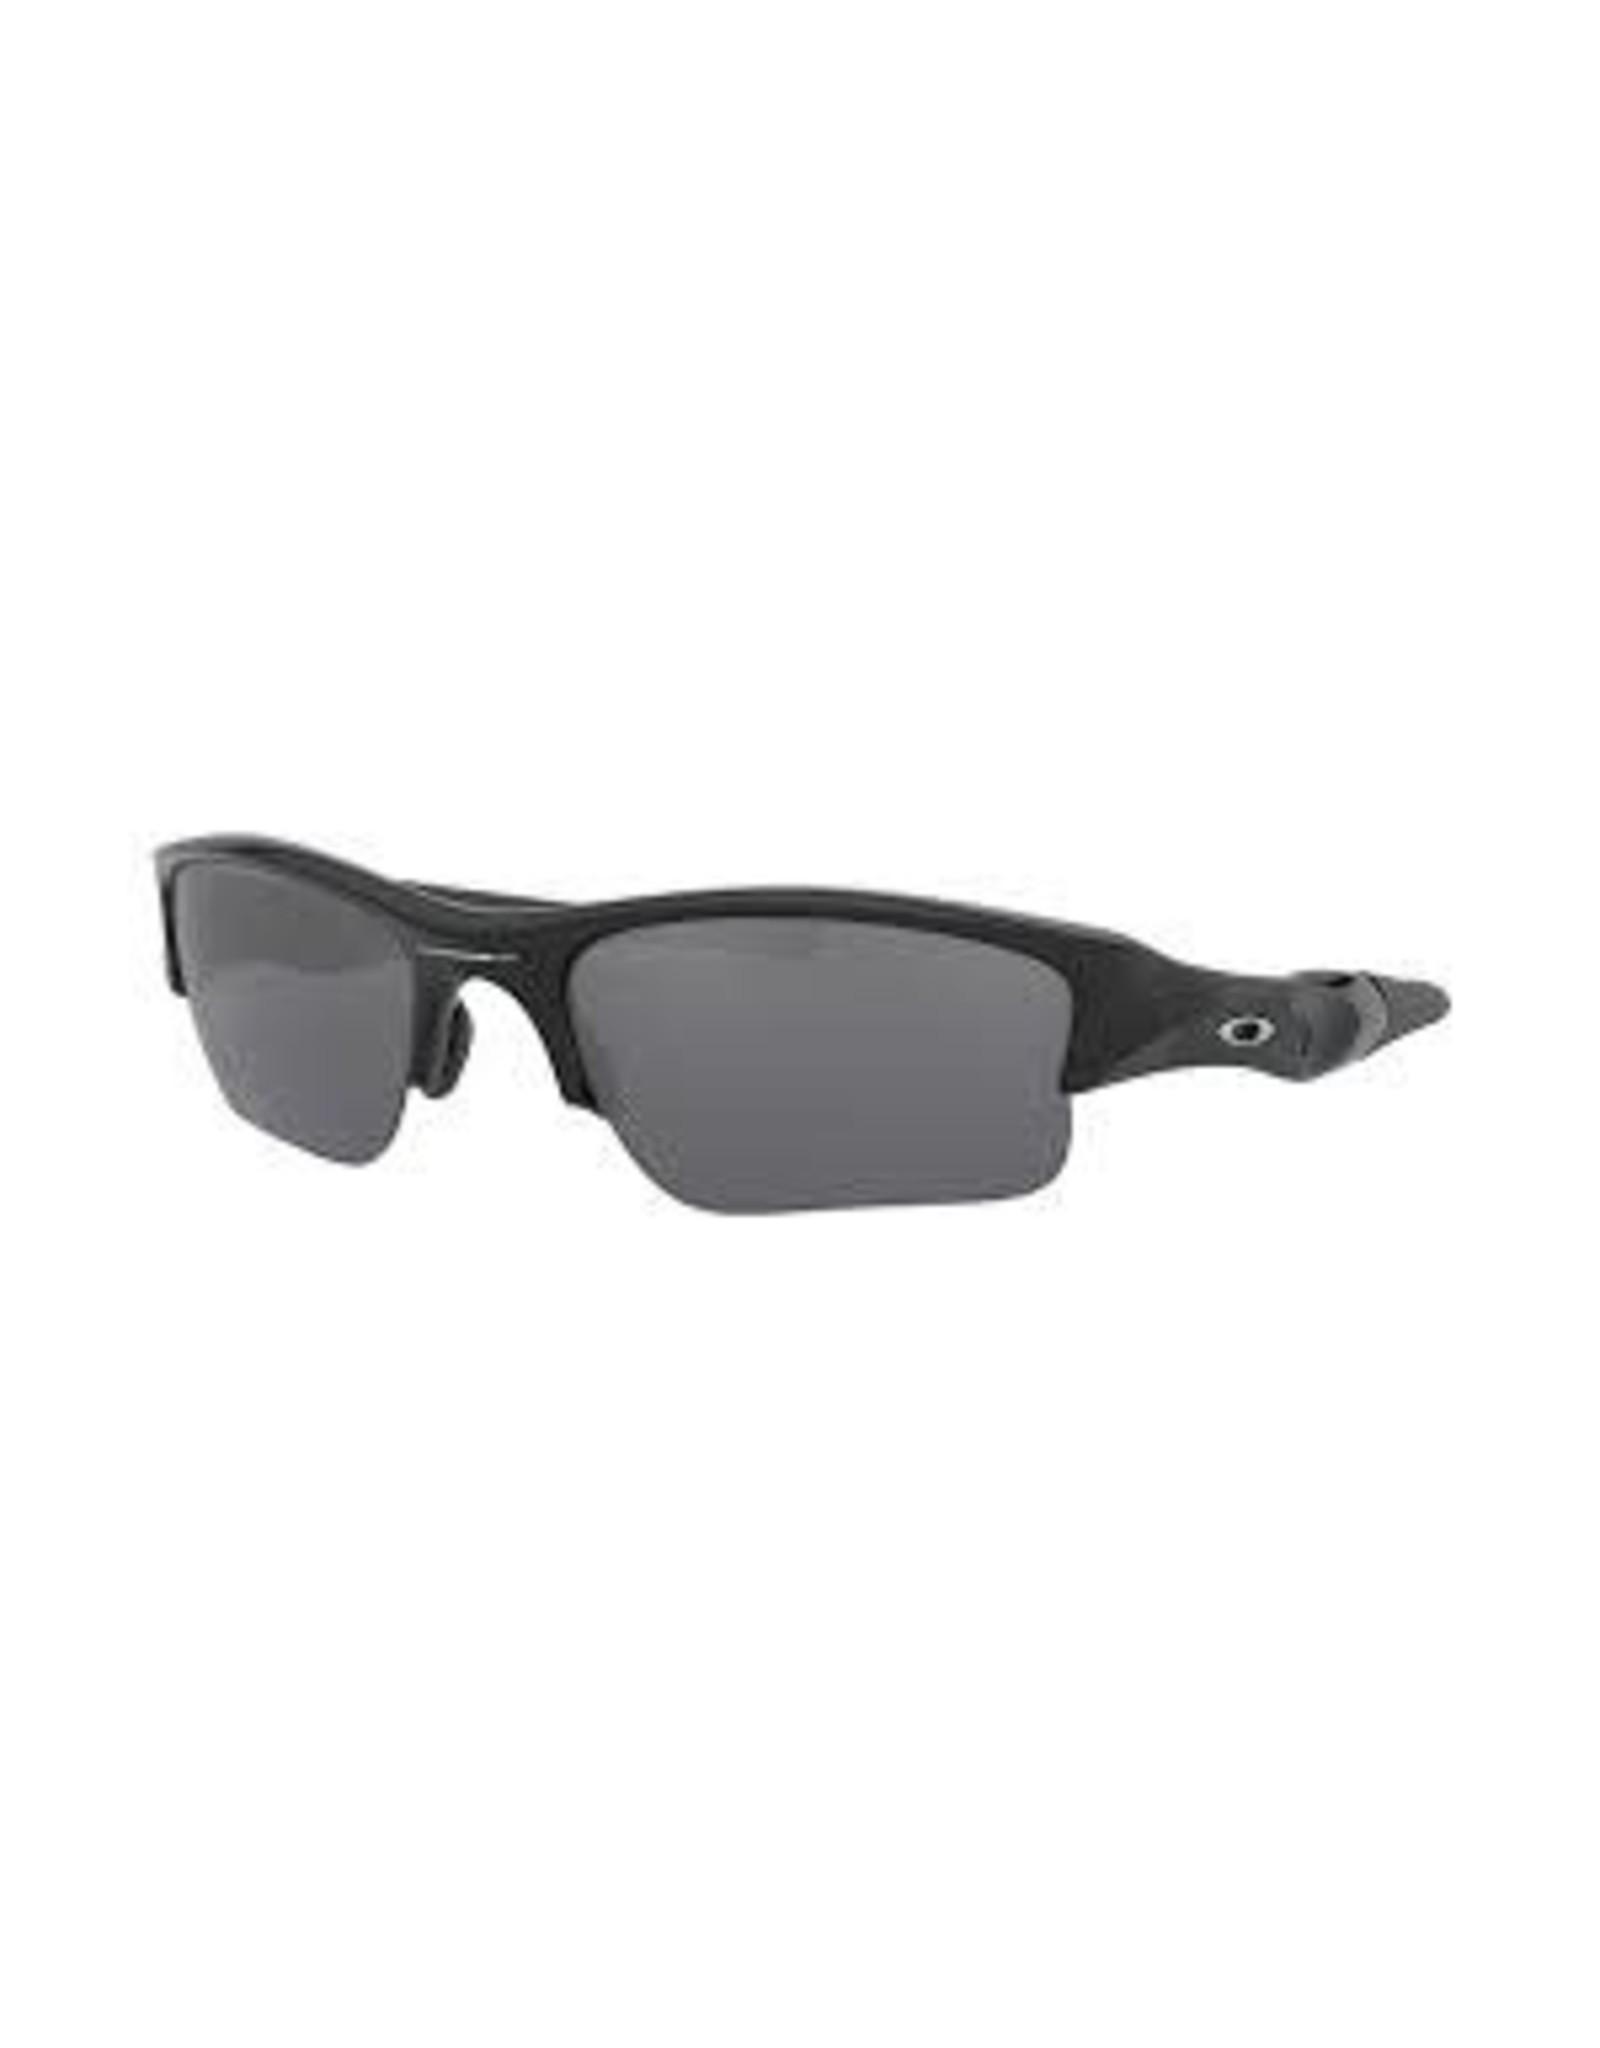 OAKLEY Flack Jacket Cycling Sunglasses